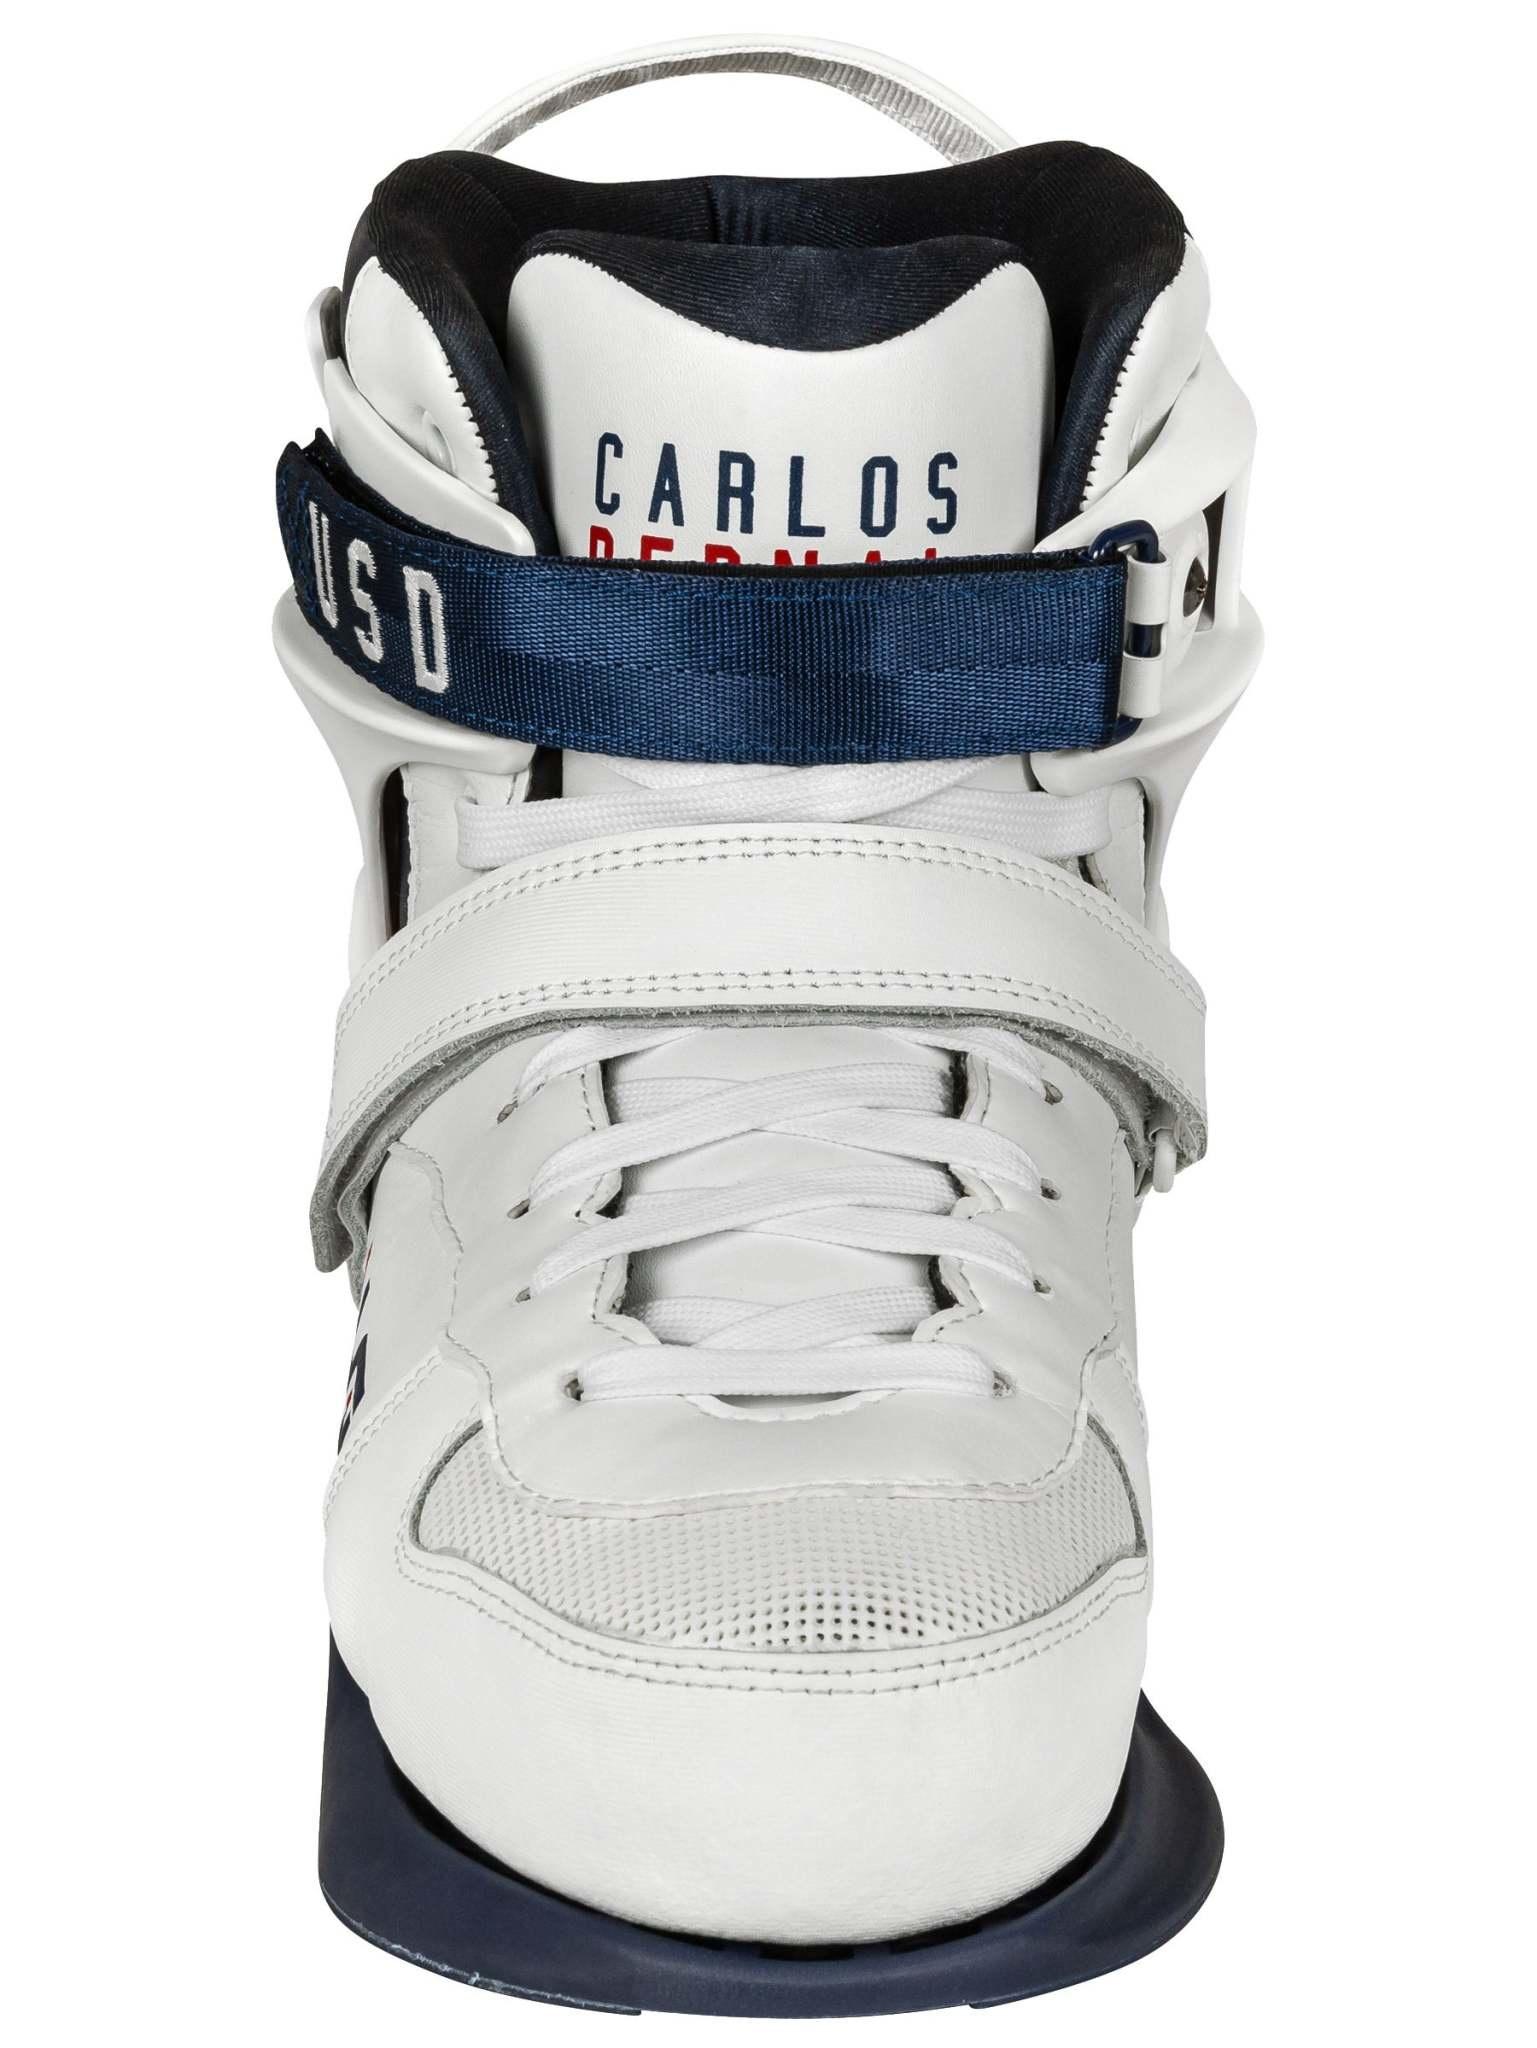 USD Carbon Free Carlos Bernal Boot